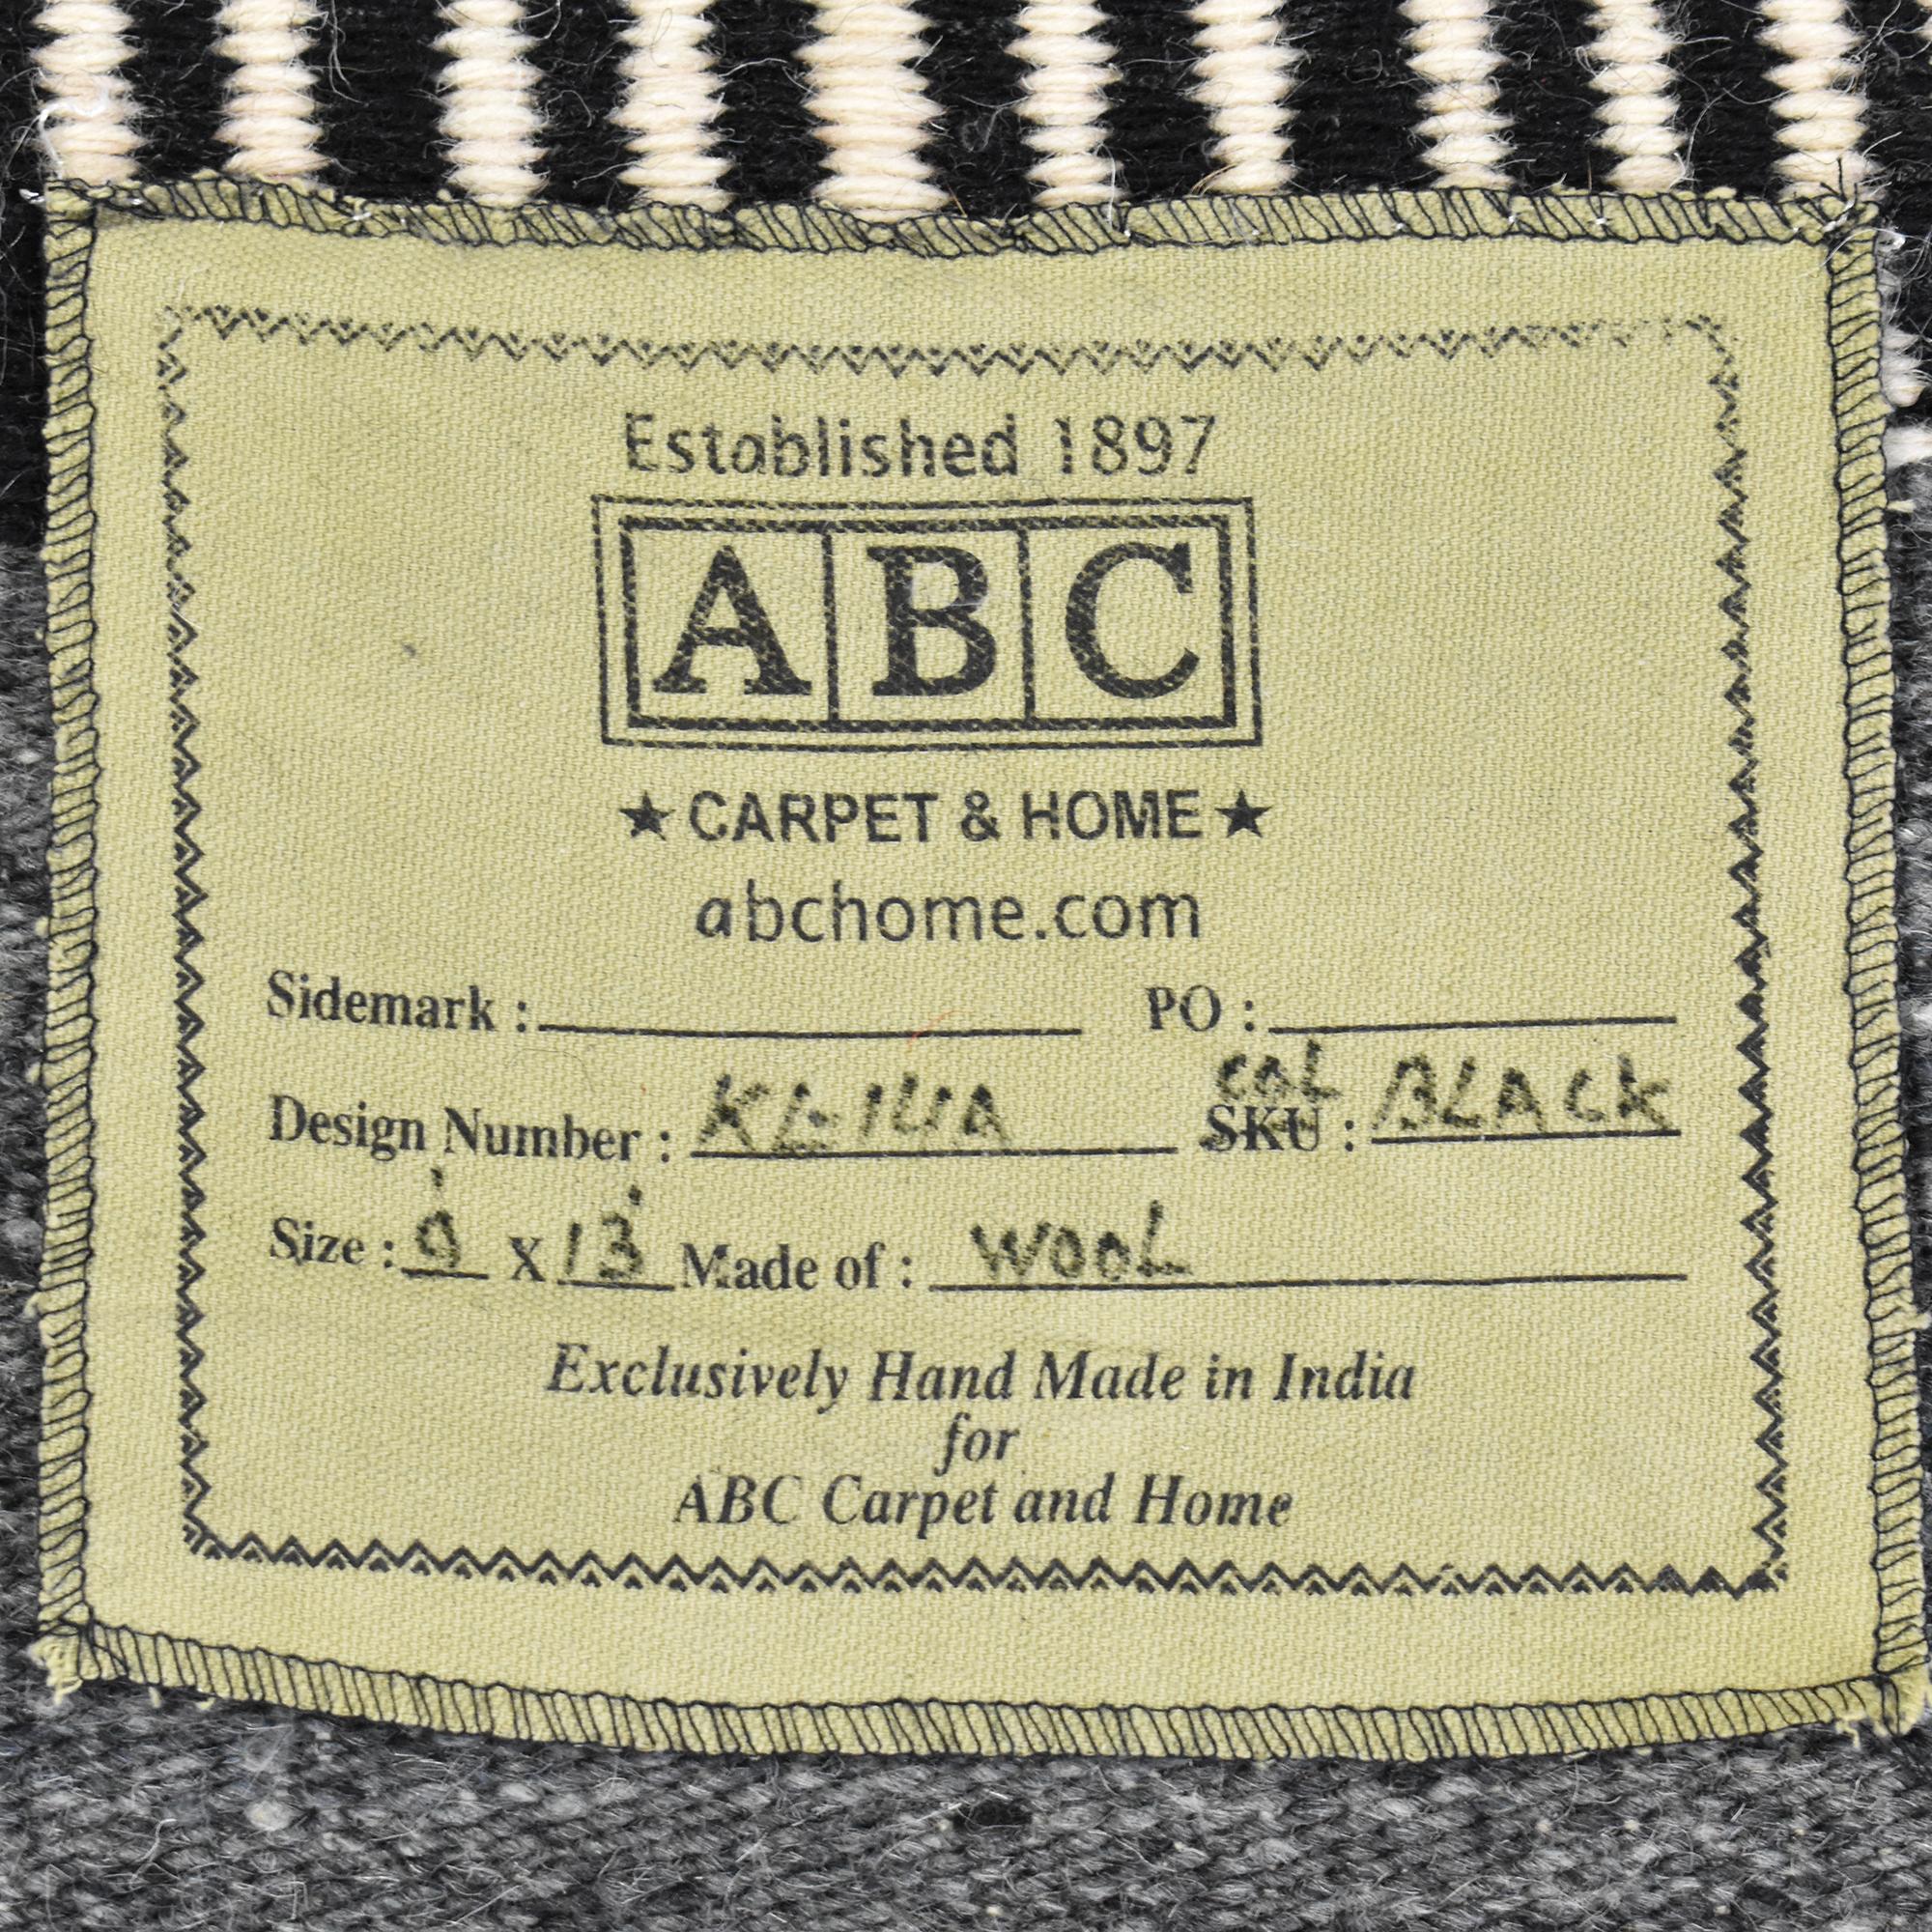 ABC Carpet & Home Flat Weave Area Rug ABC Carpet & Home